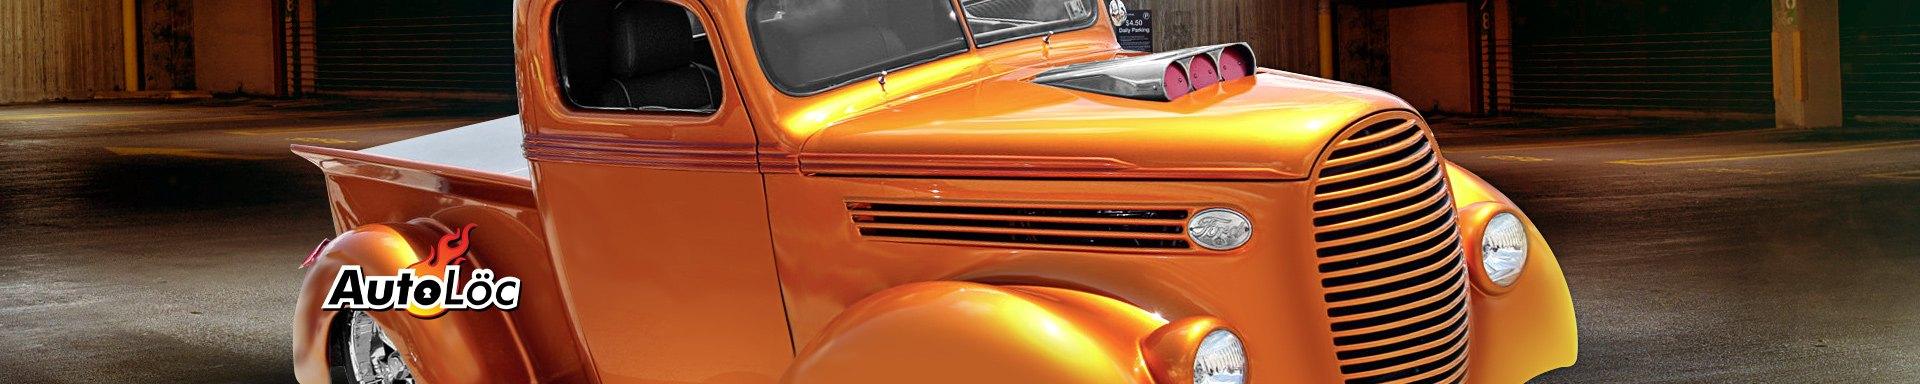 Autoloc Headlights